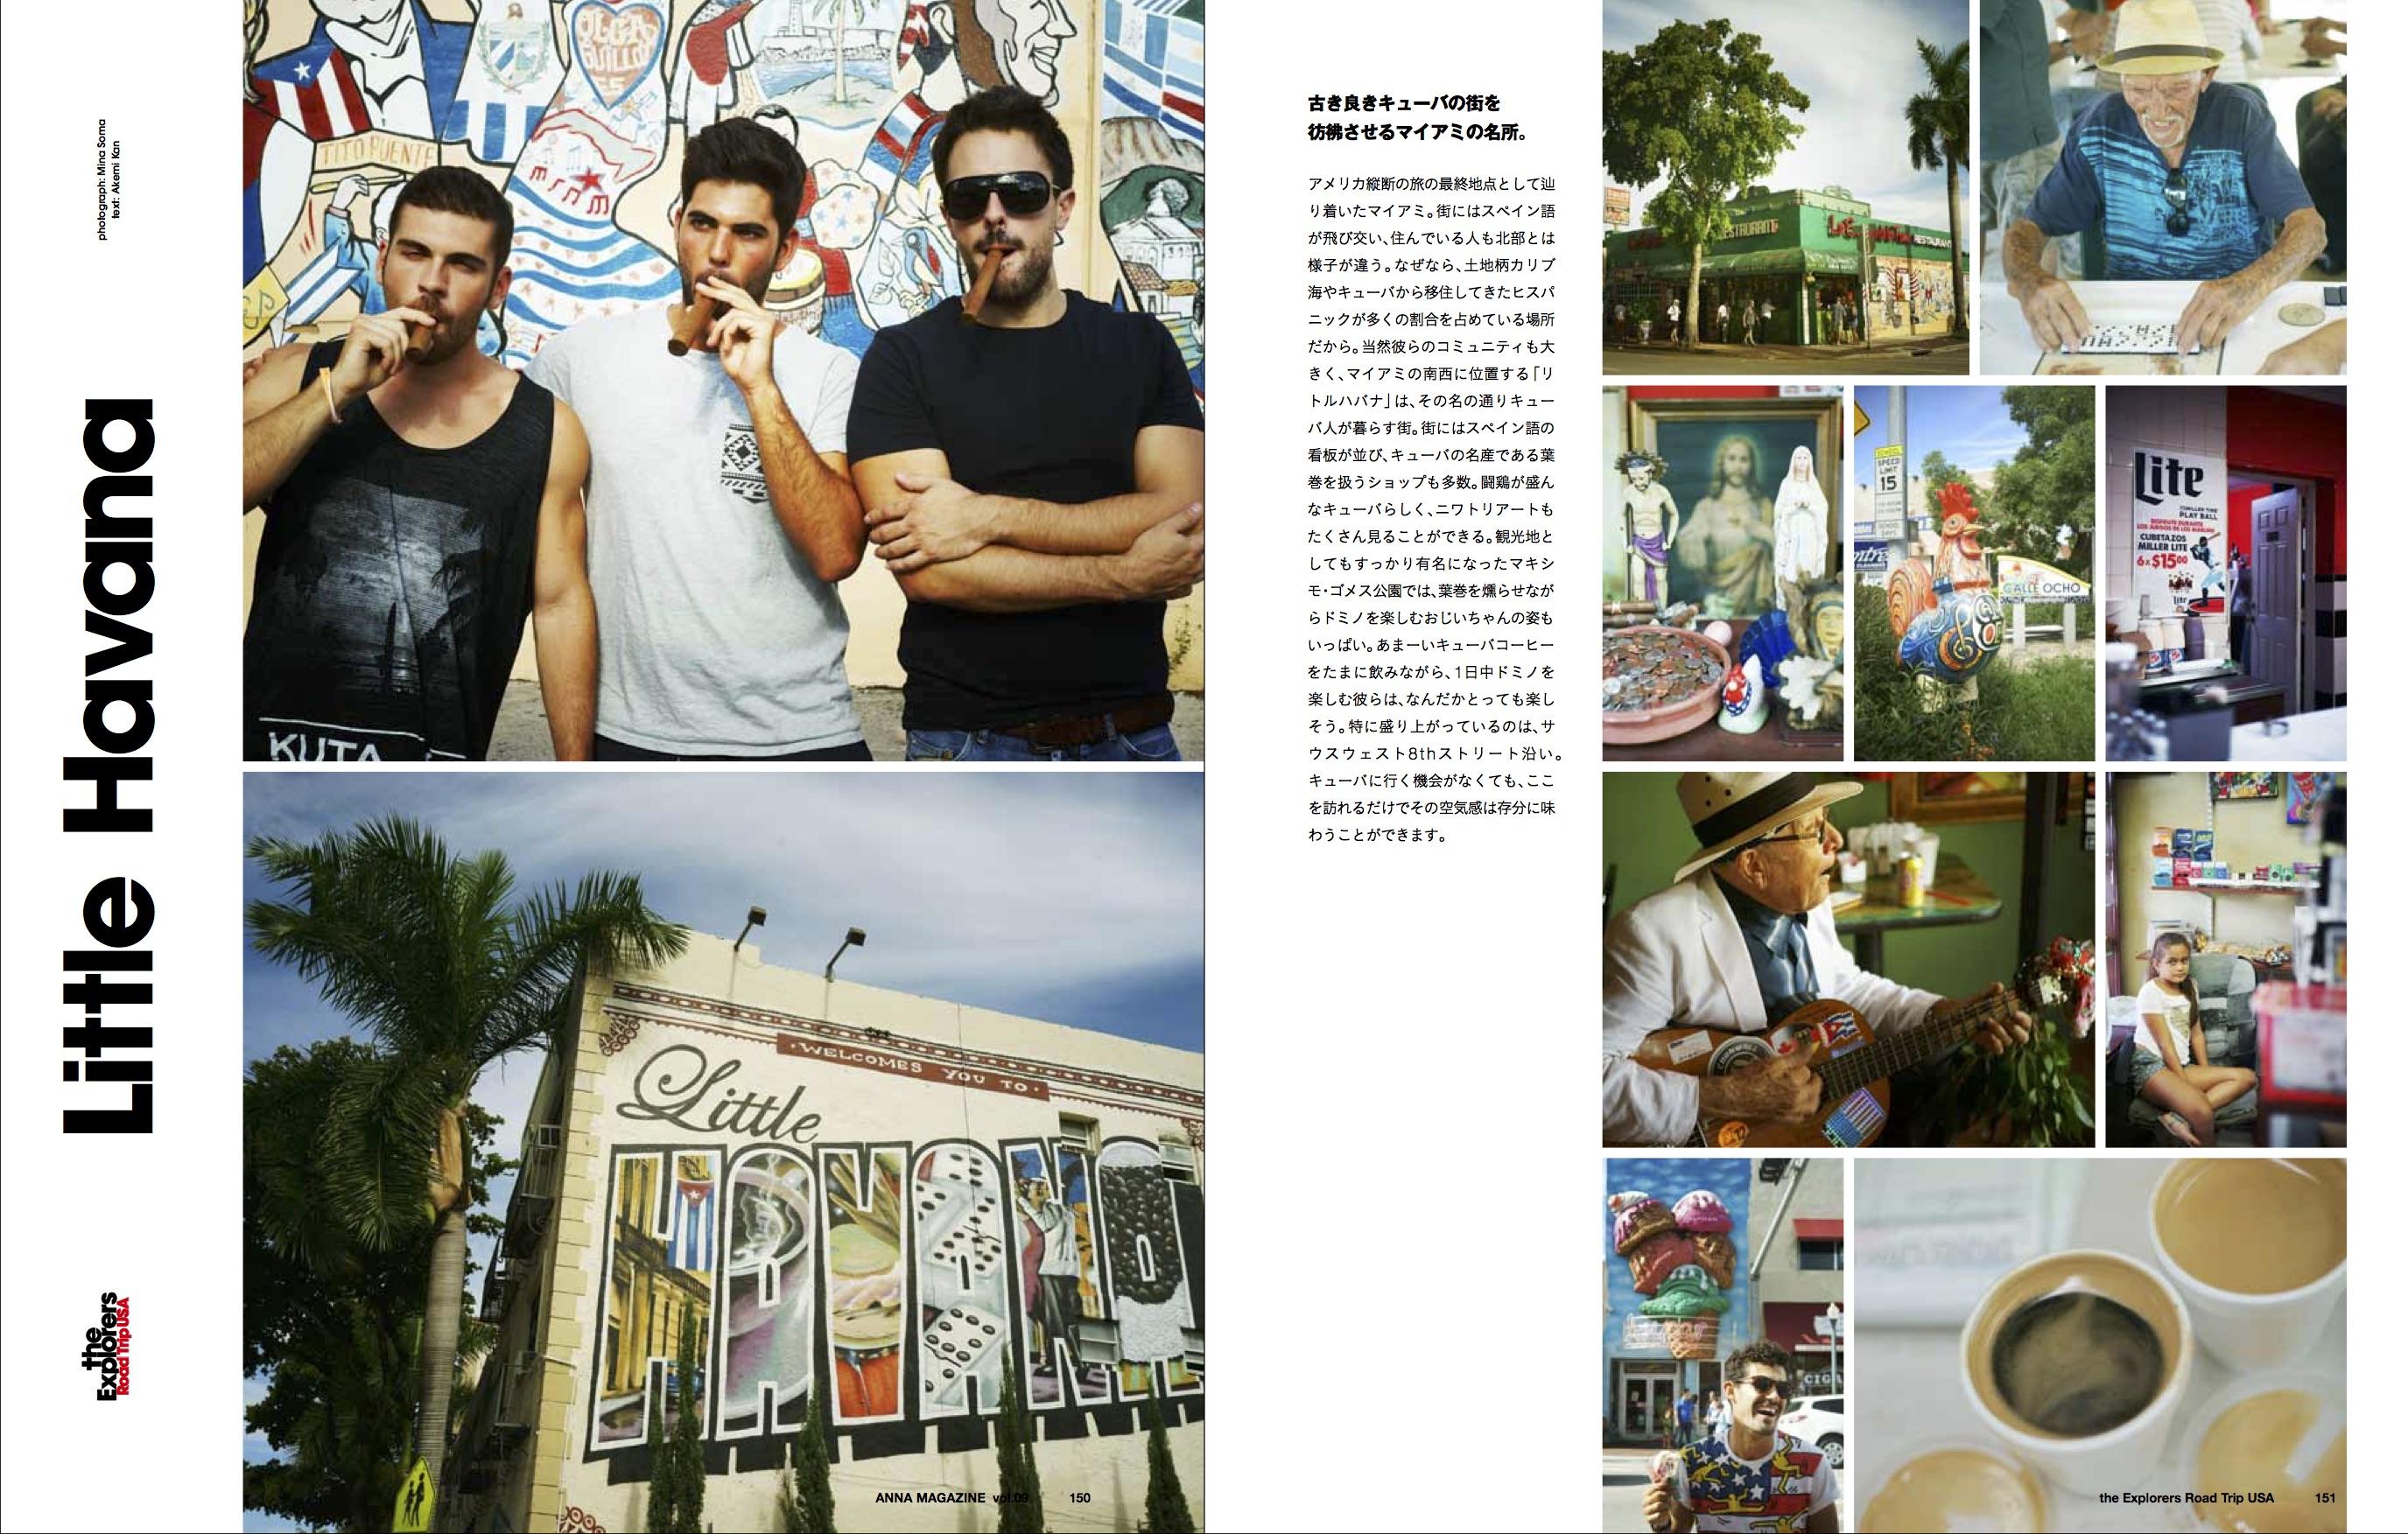 anna magazine vol.9 P75